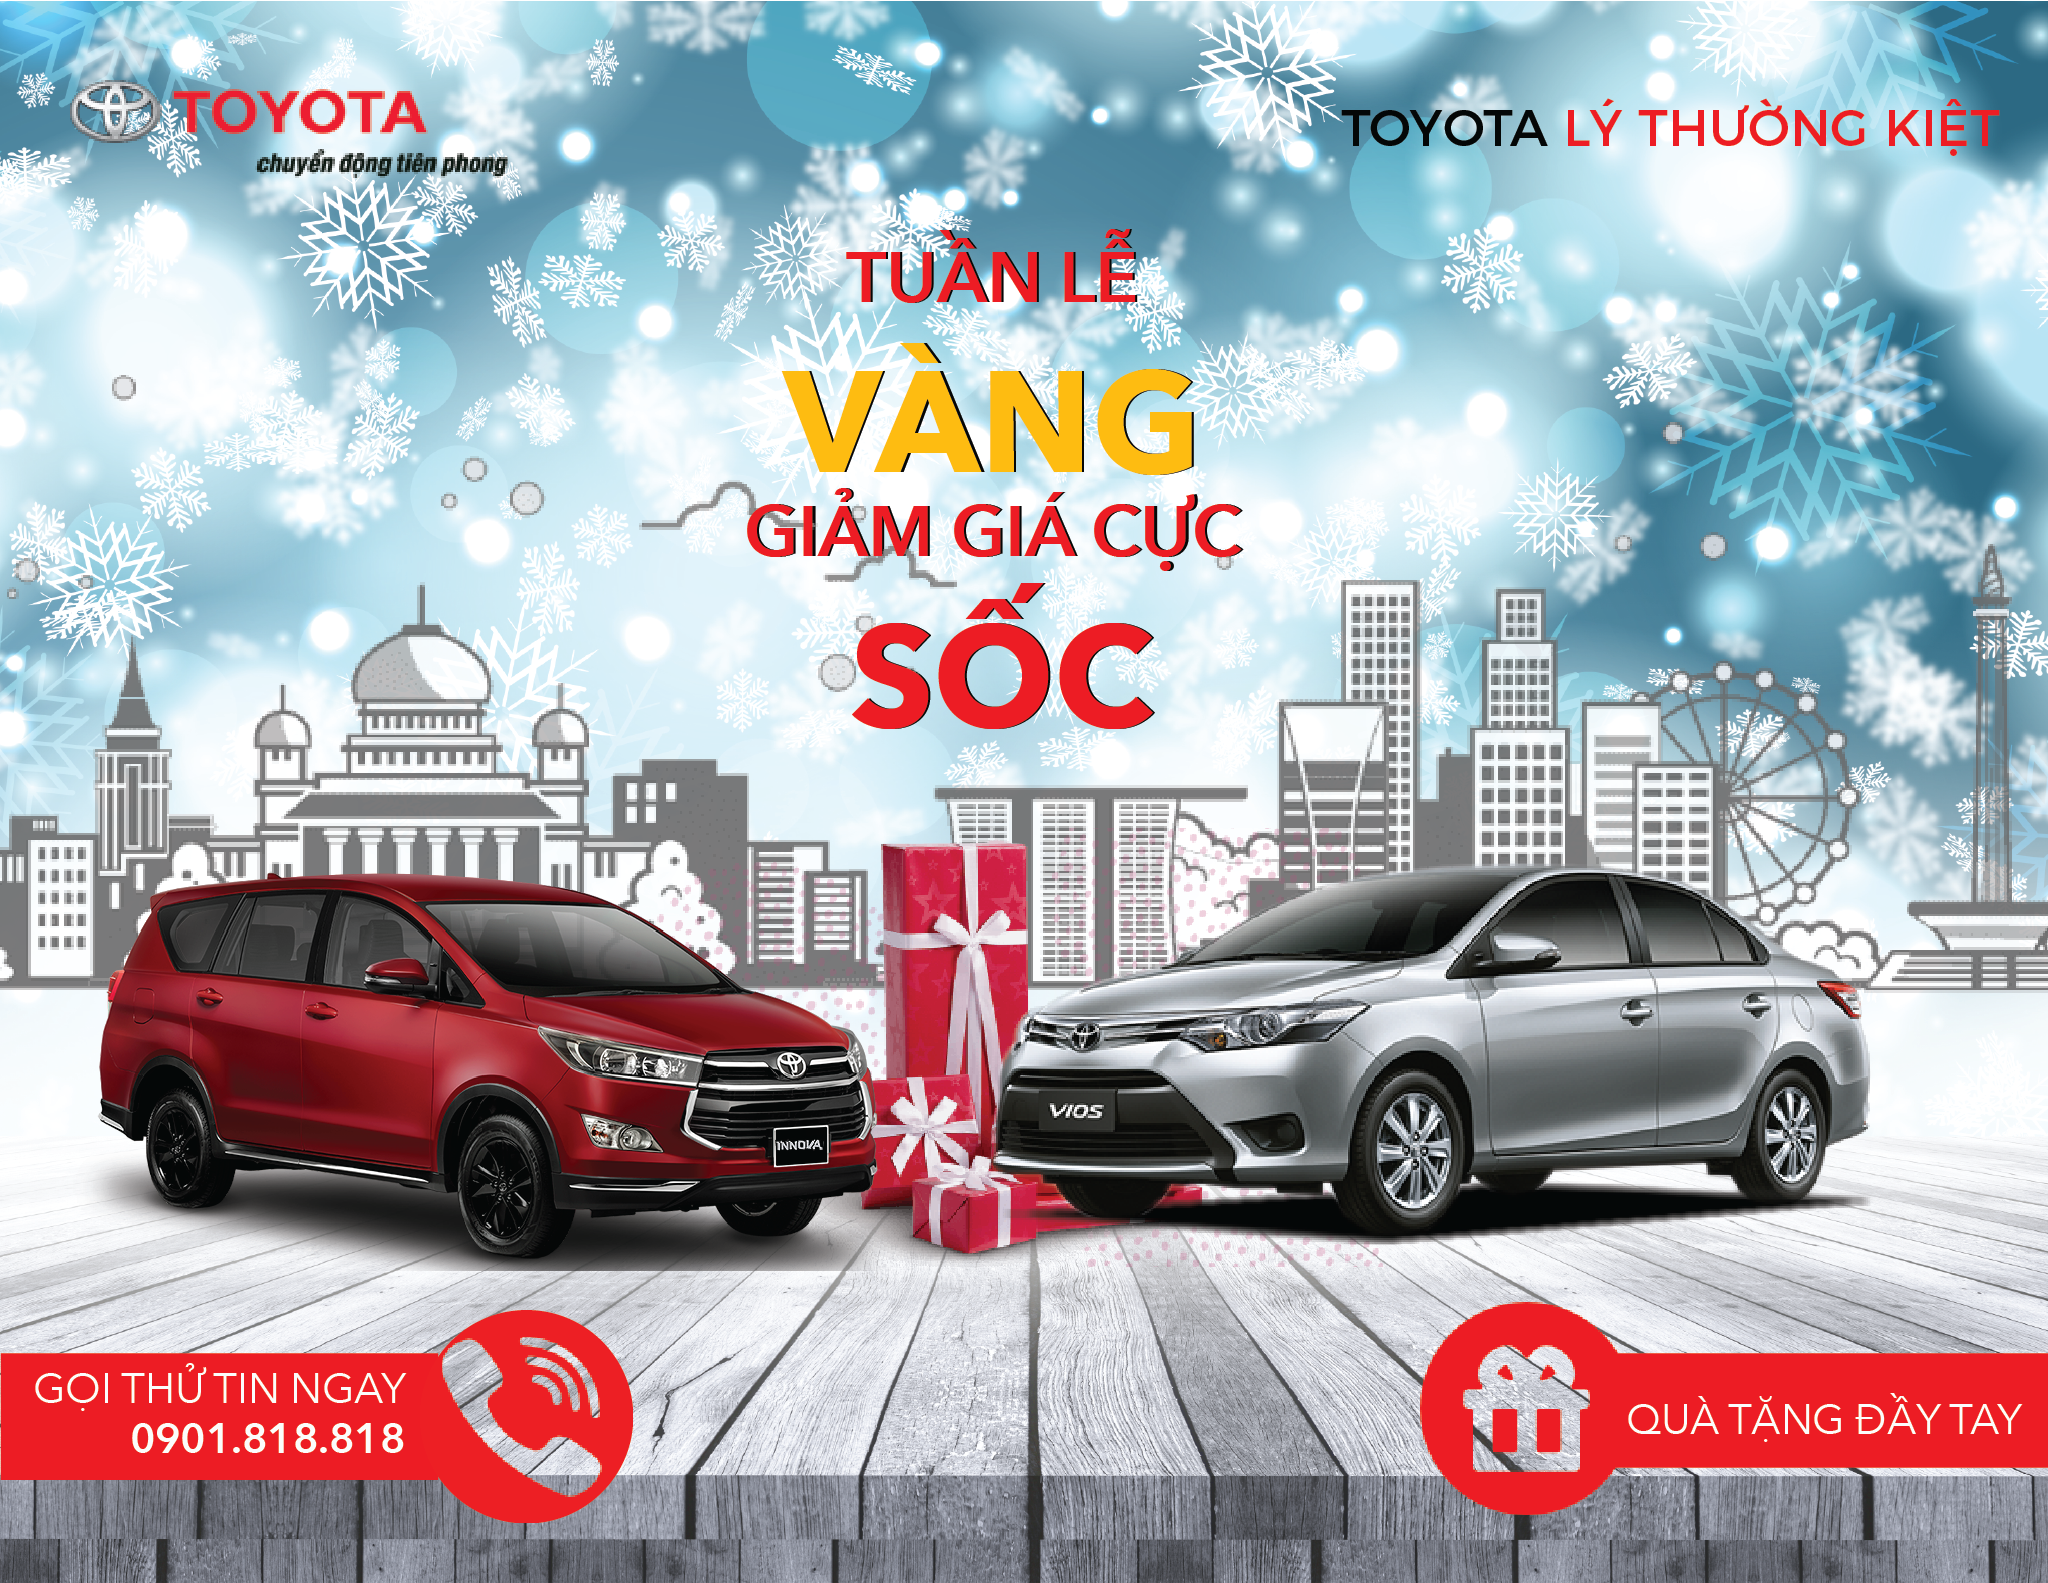 Toyota Vios E 2018 giá sốc